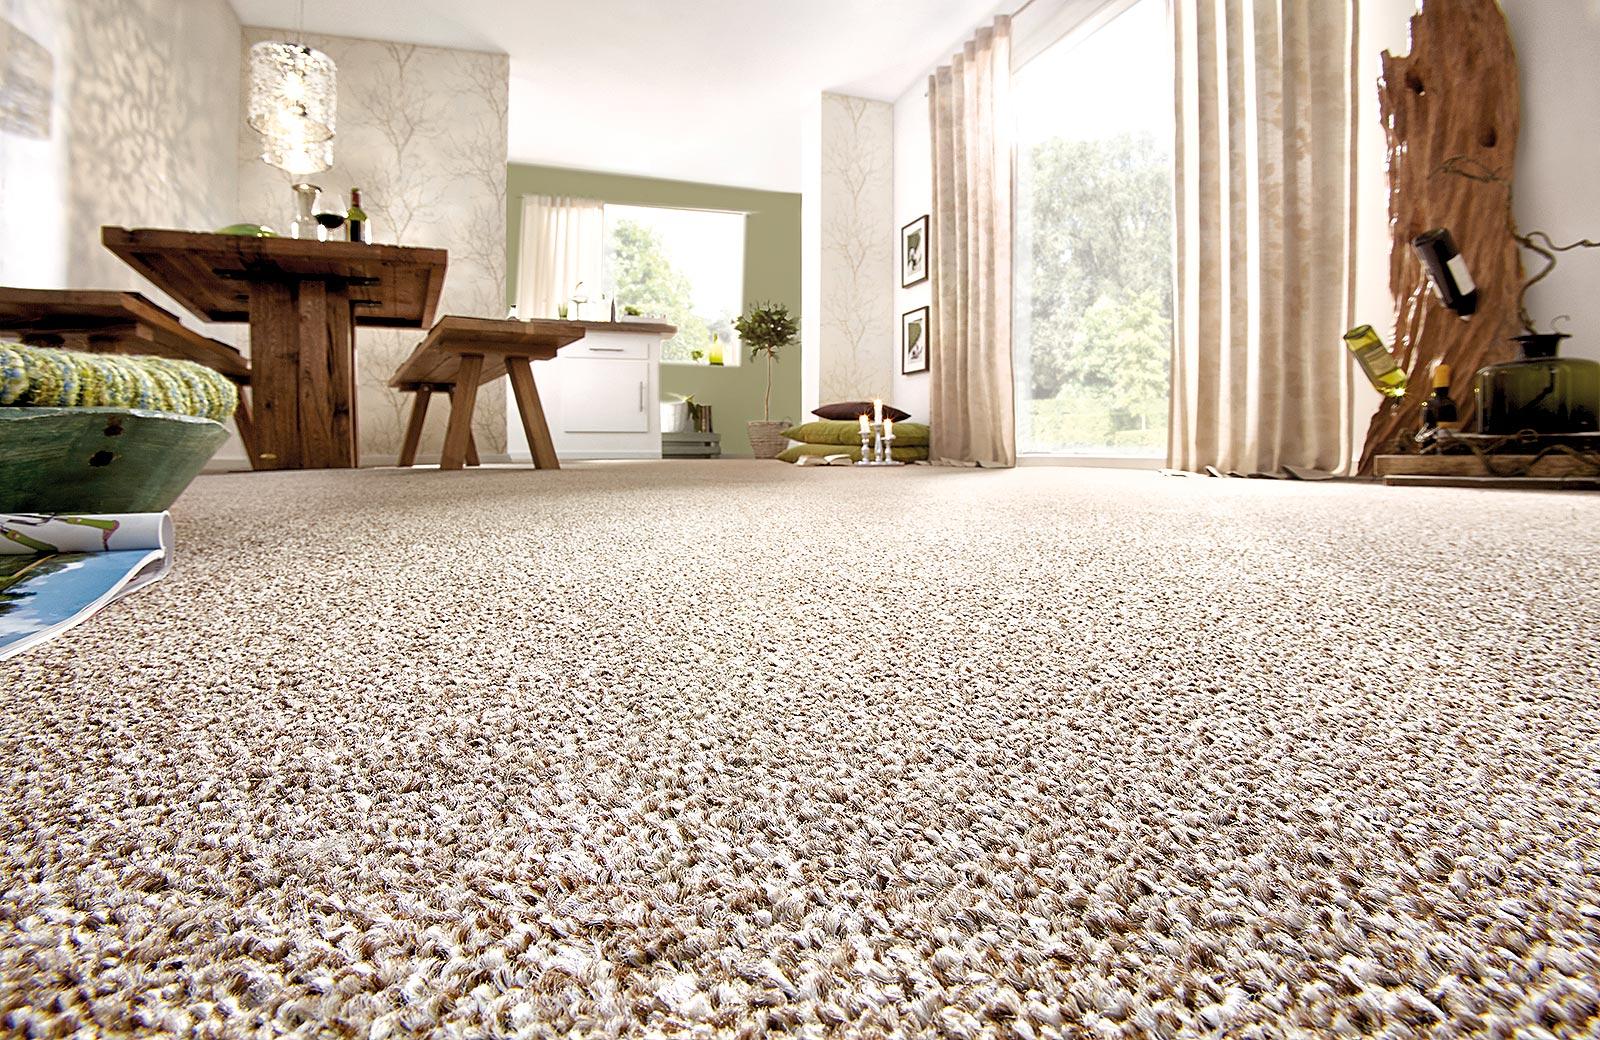 teppich und teppichboden kristian s bodenbel ge bad s ckingen. Black Bedroom Furniture Sets. Home Design Ideas